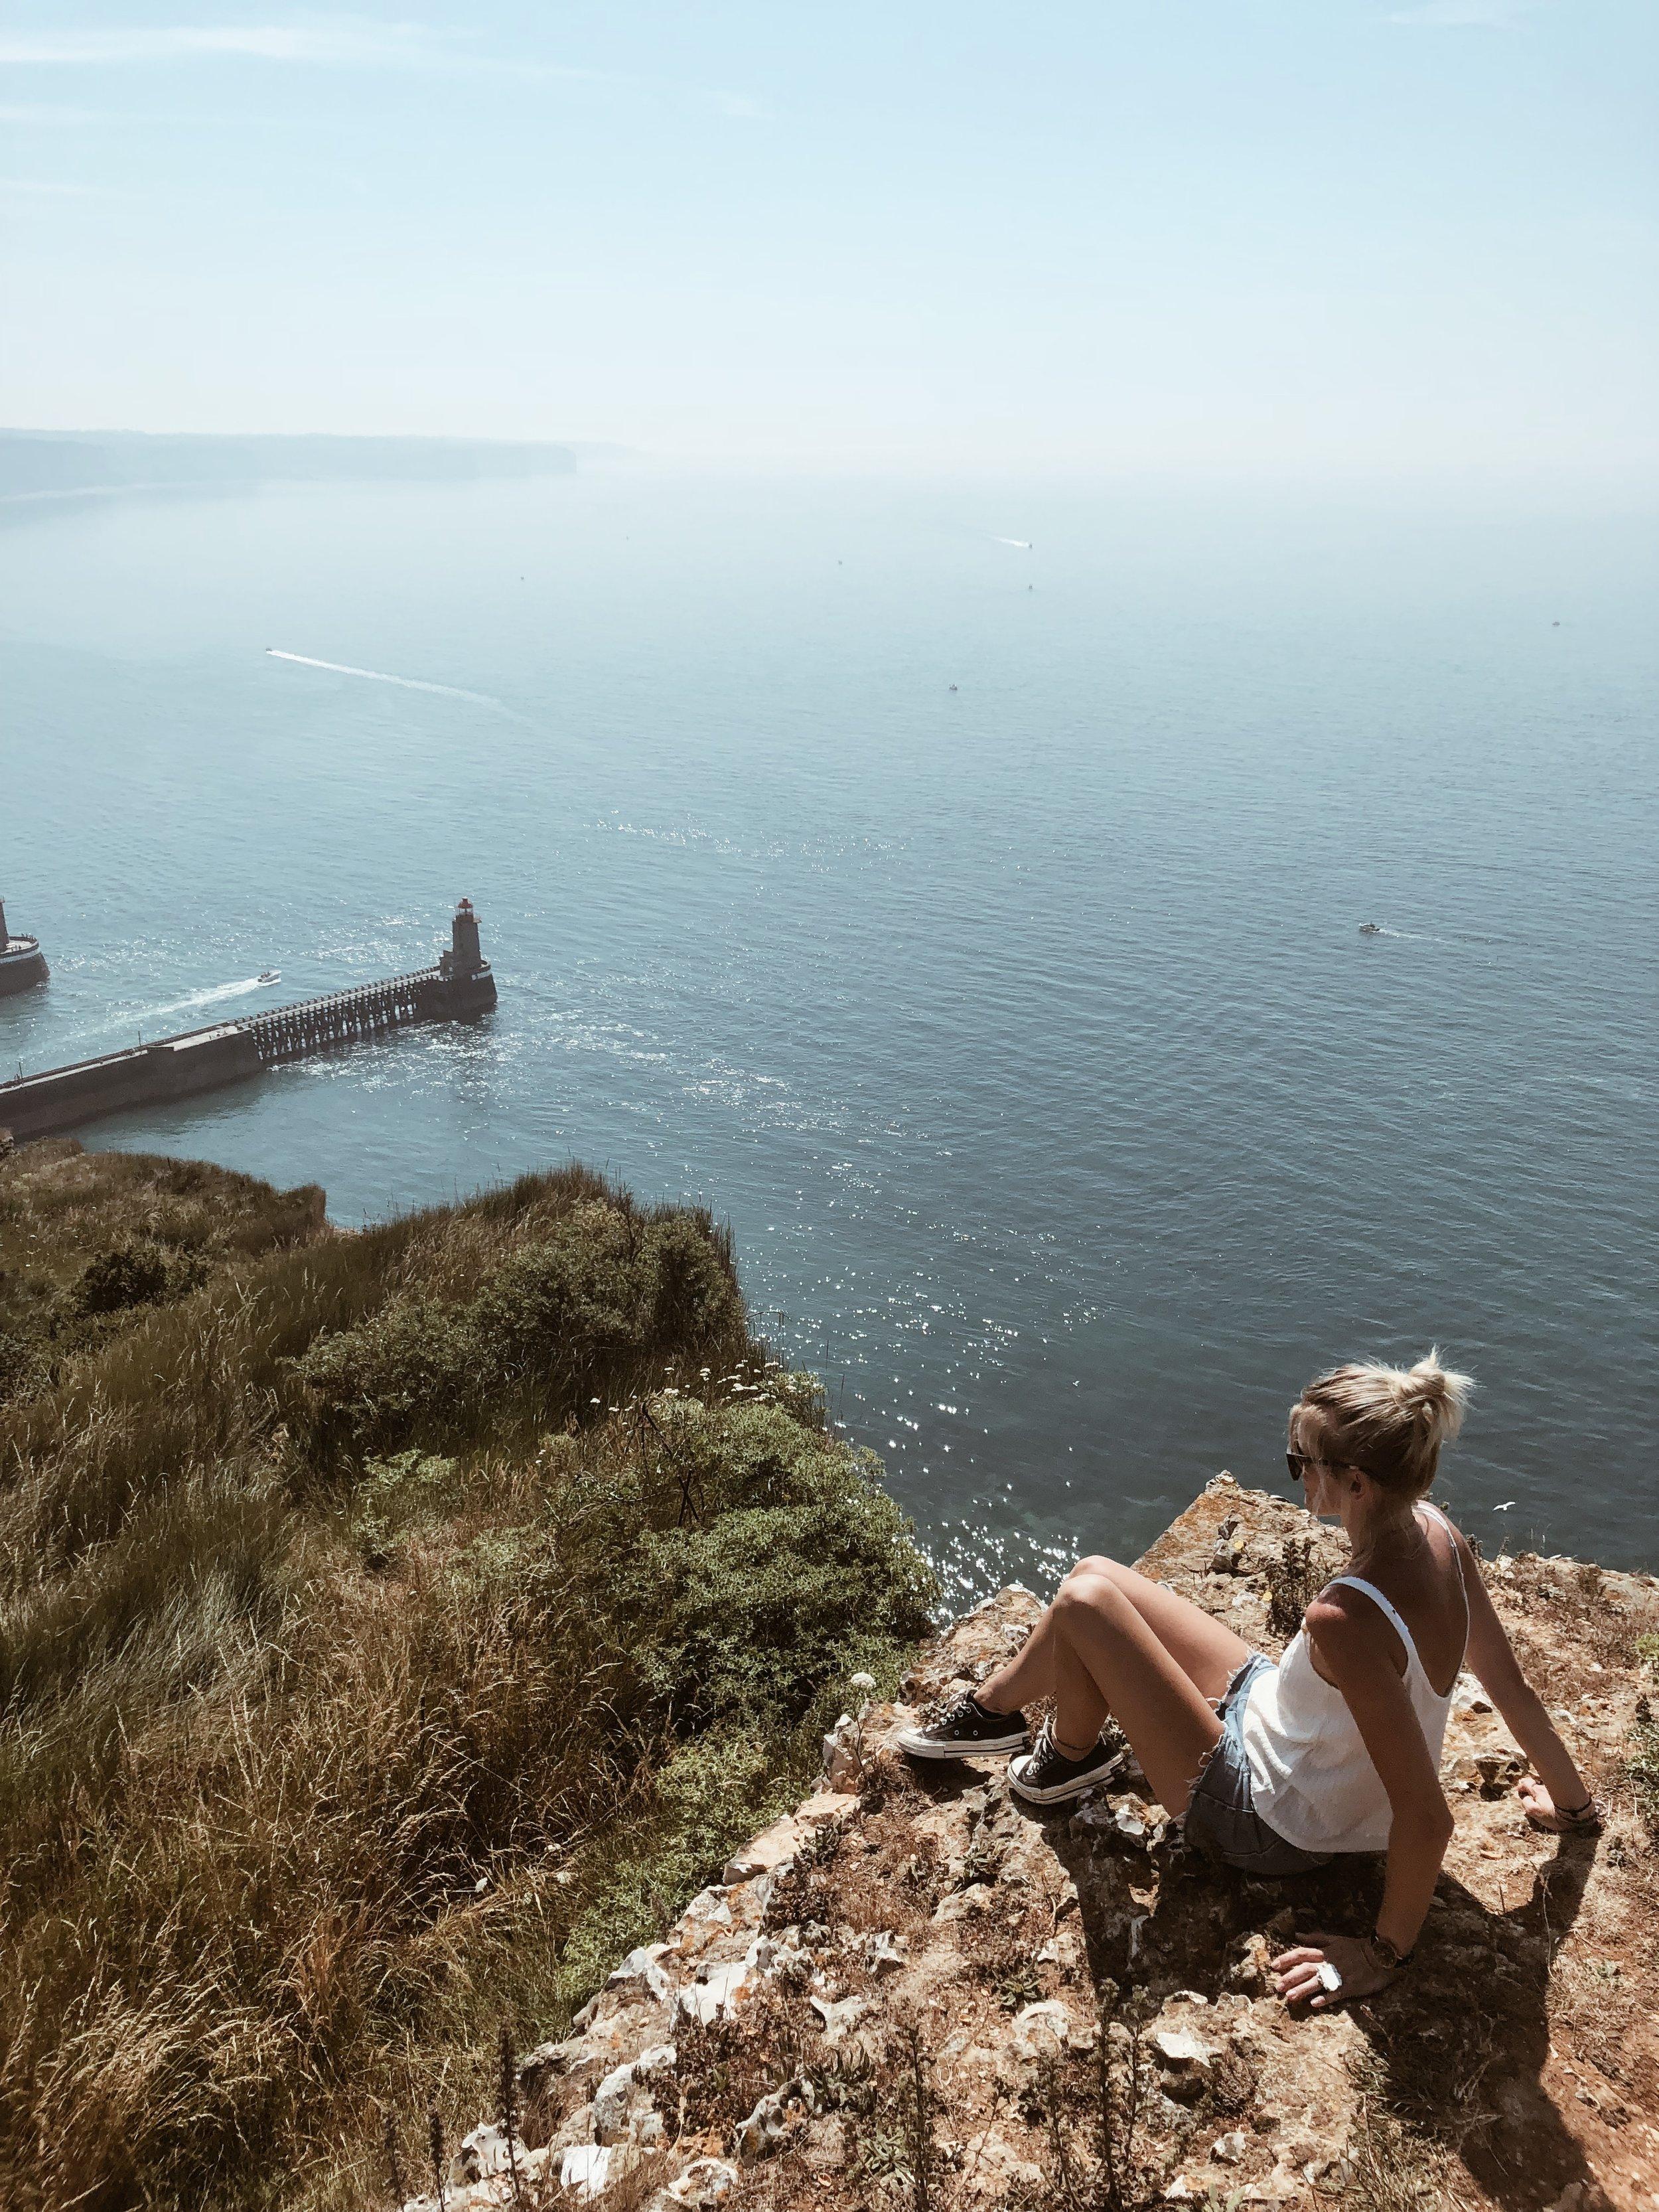 Carnet sauvage- blog voyage - weekend Etretat31.JPG